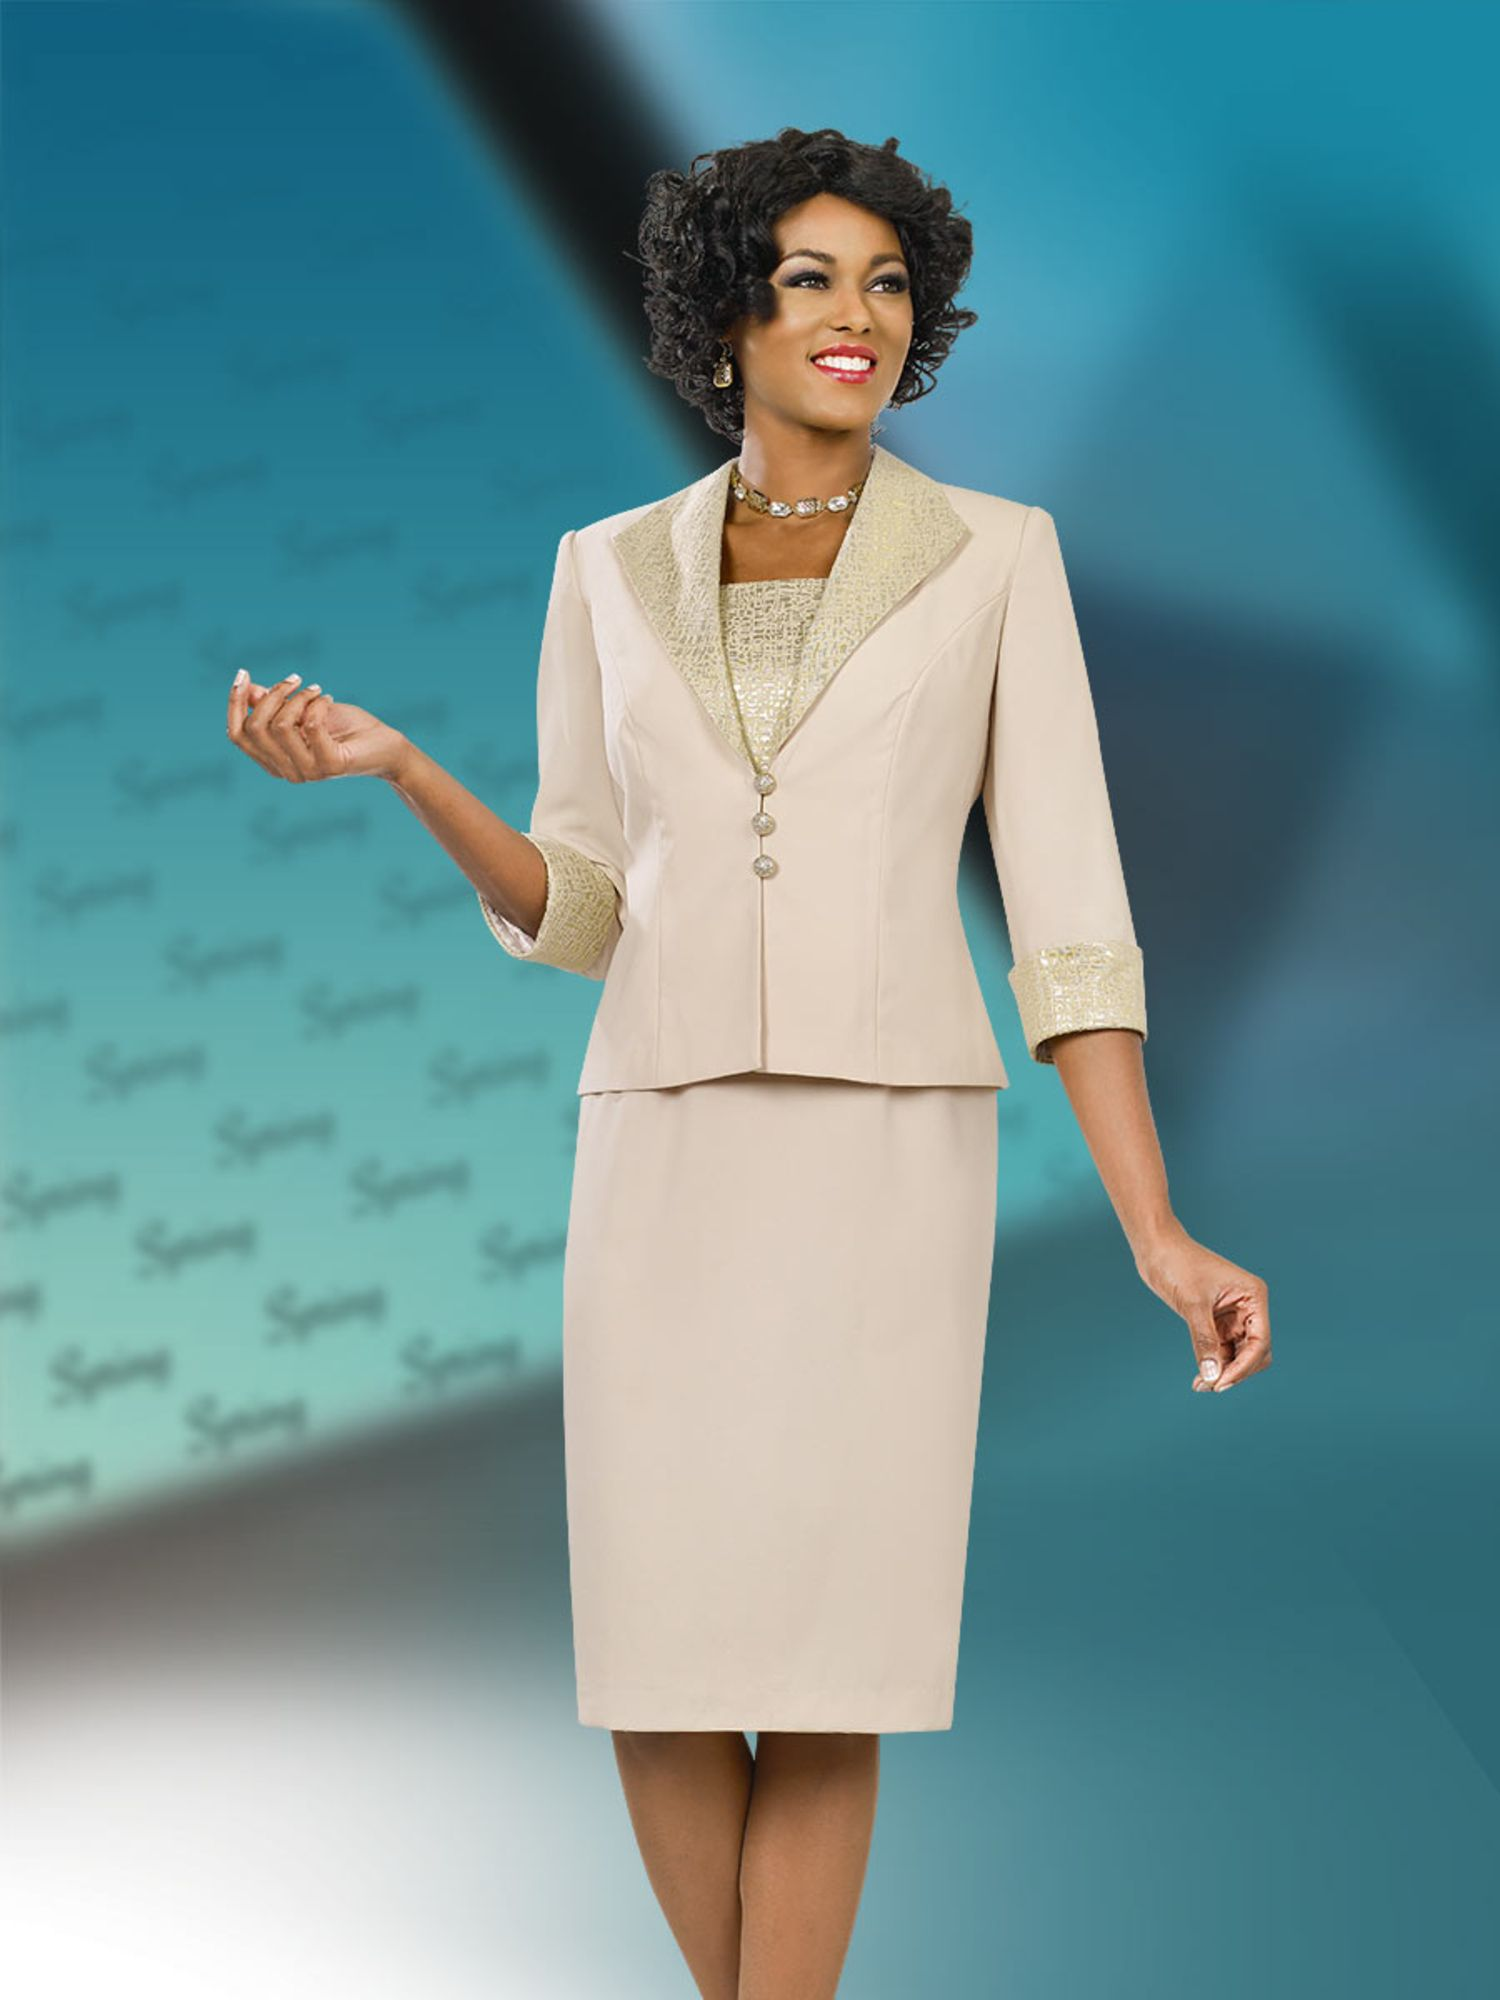 Benmarc Executive Dress & Jacket 11510 | Work suits, Church suits ...